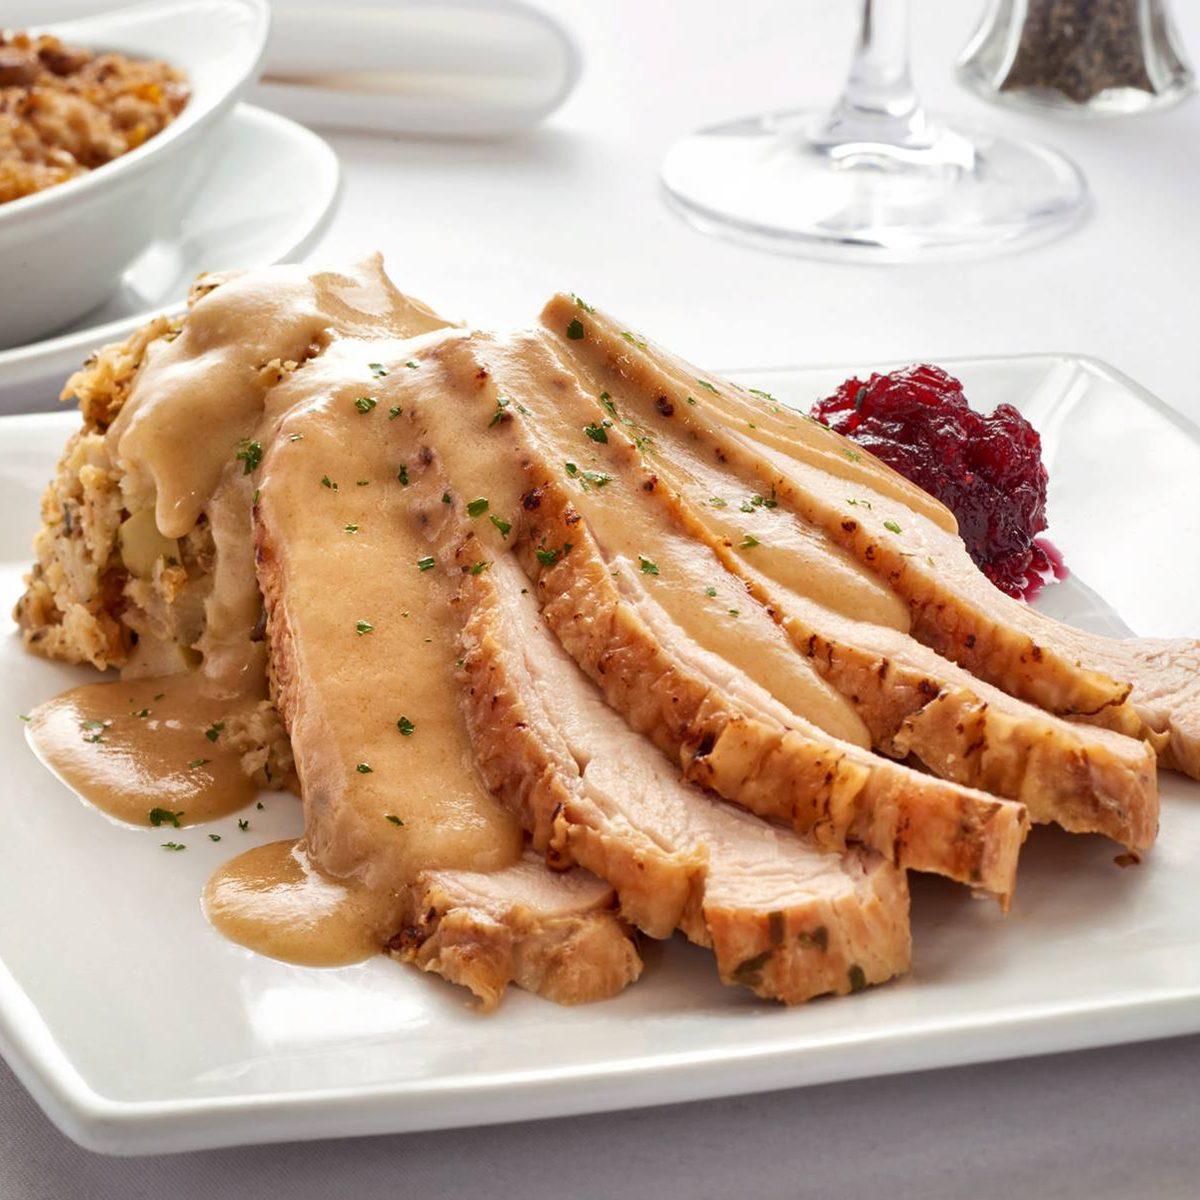 Turkey dinner at Ruth's Chris Steak House